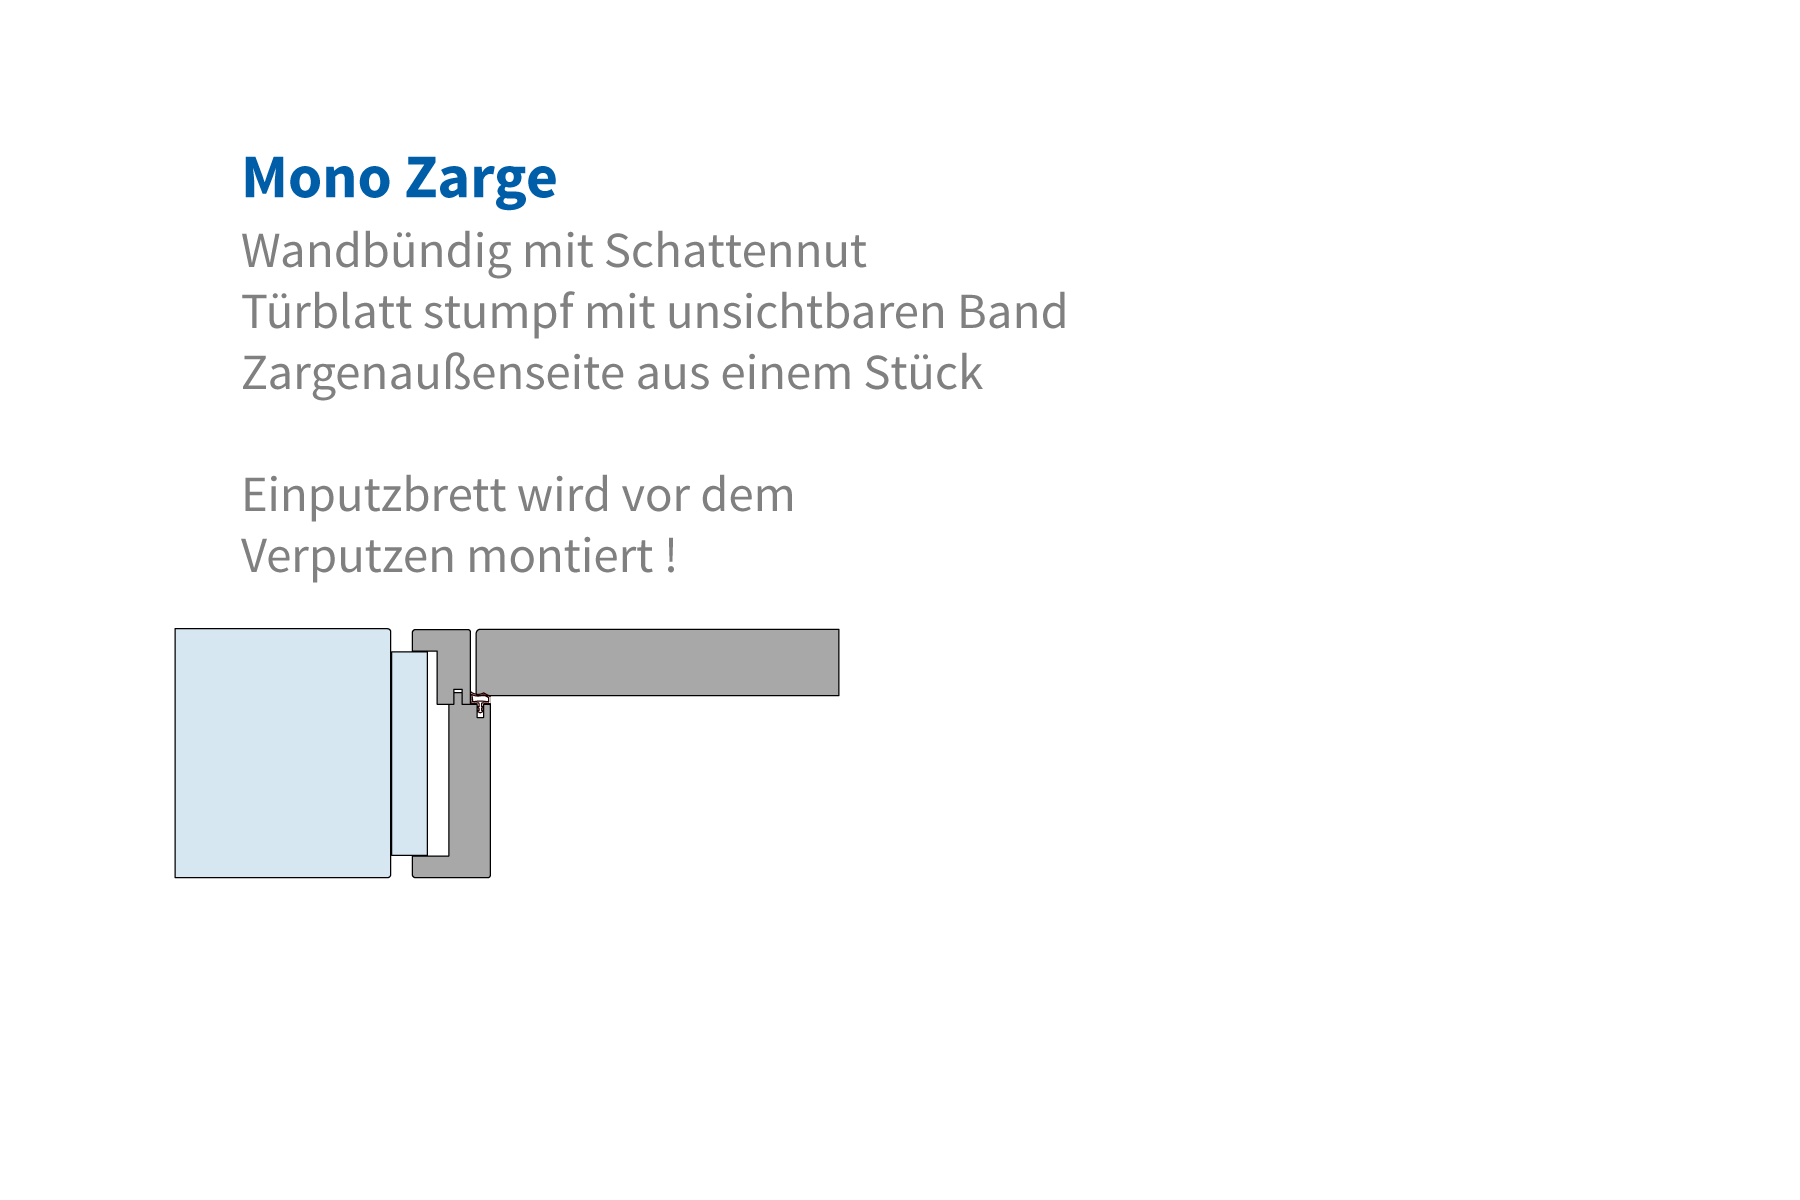 Mono Zarge